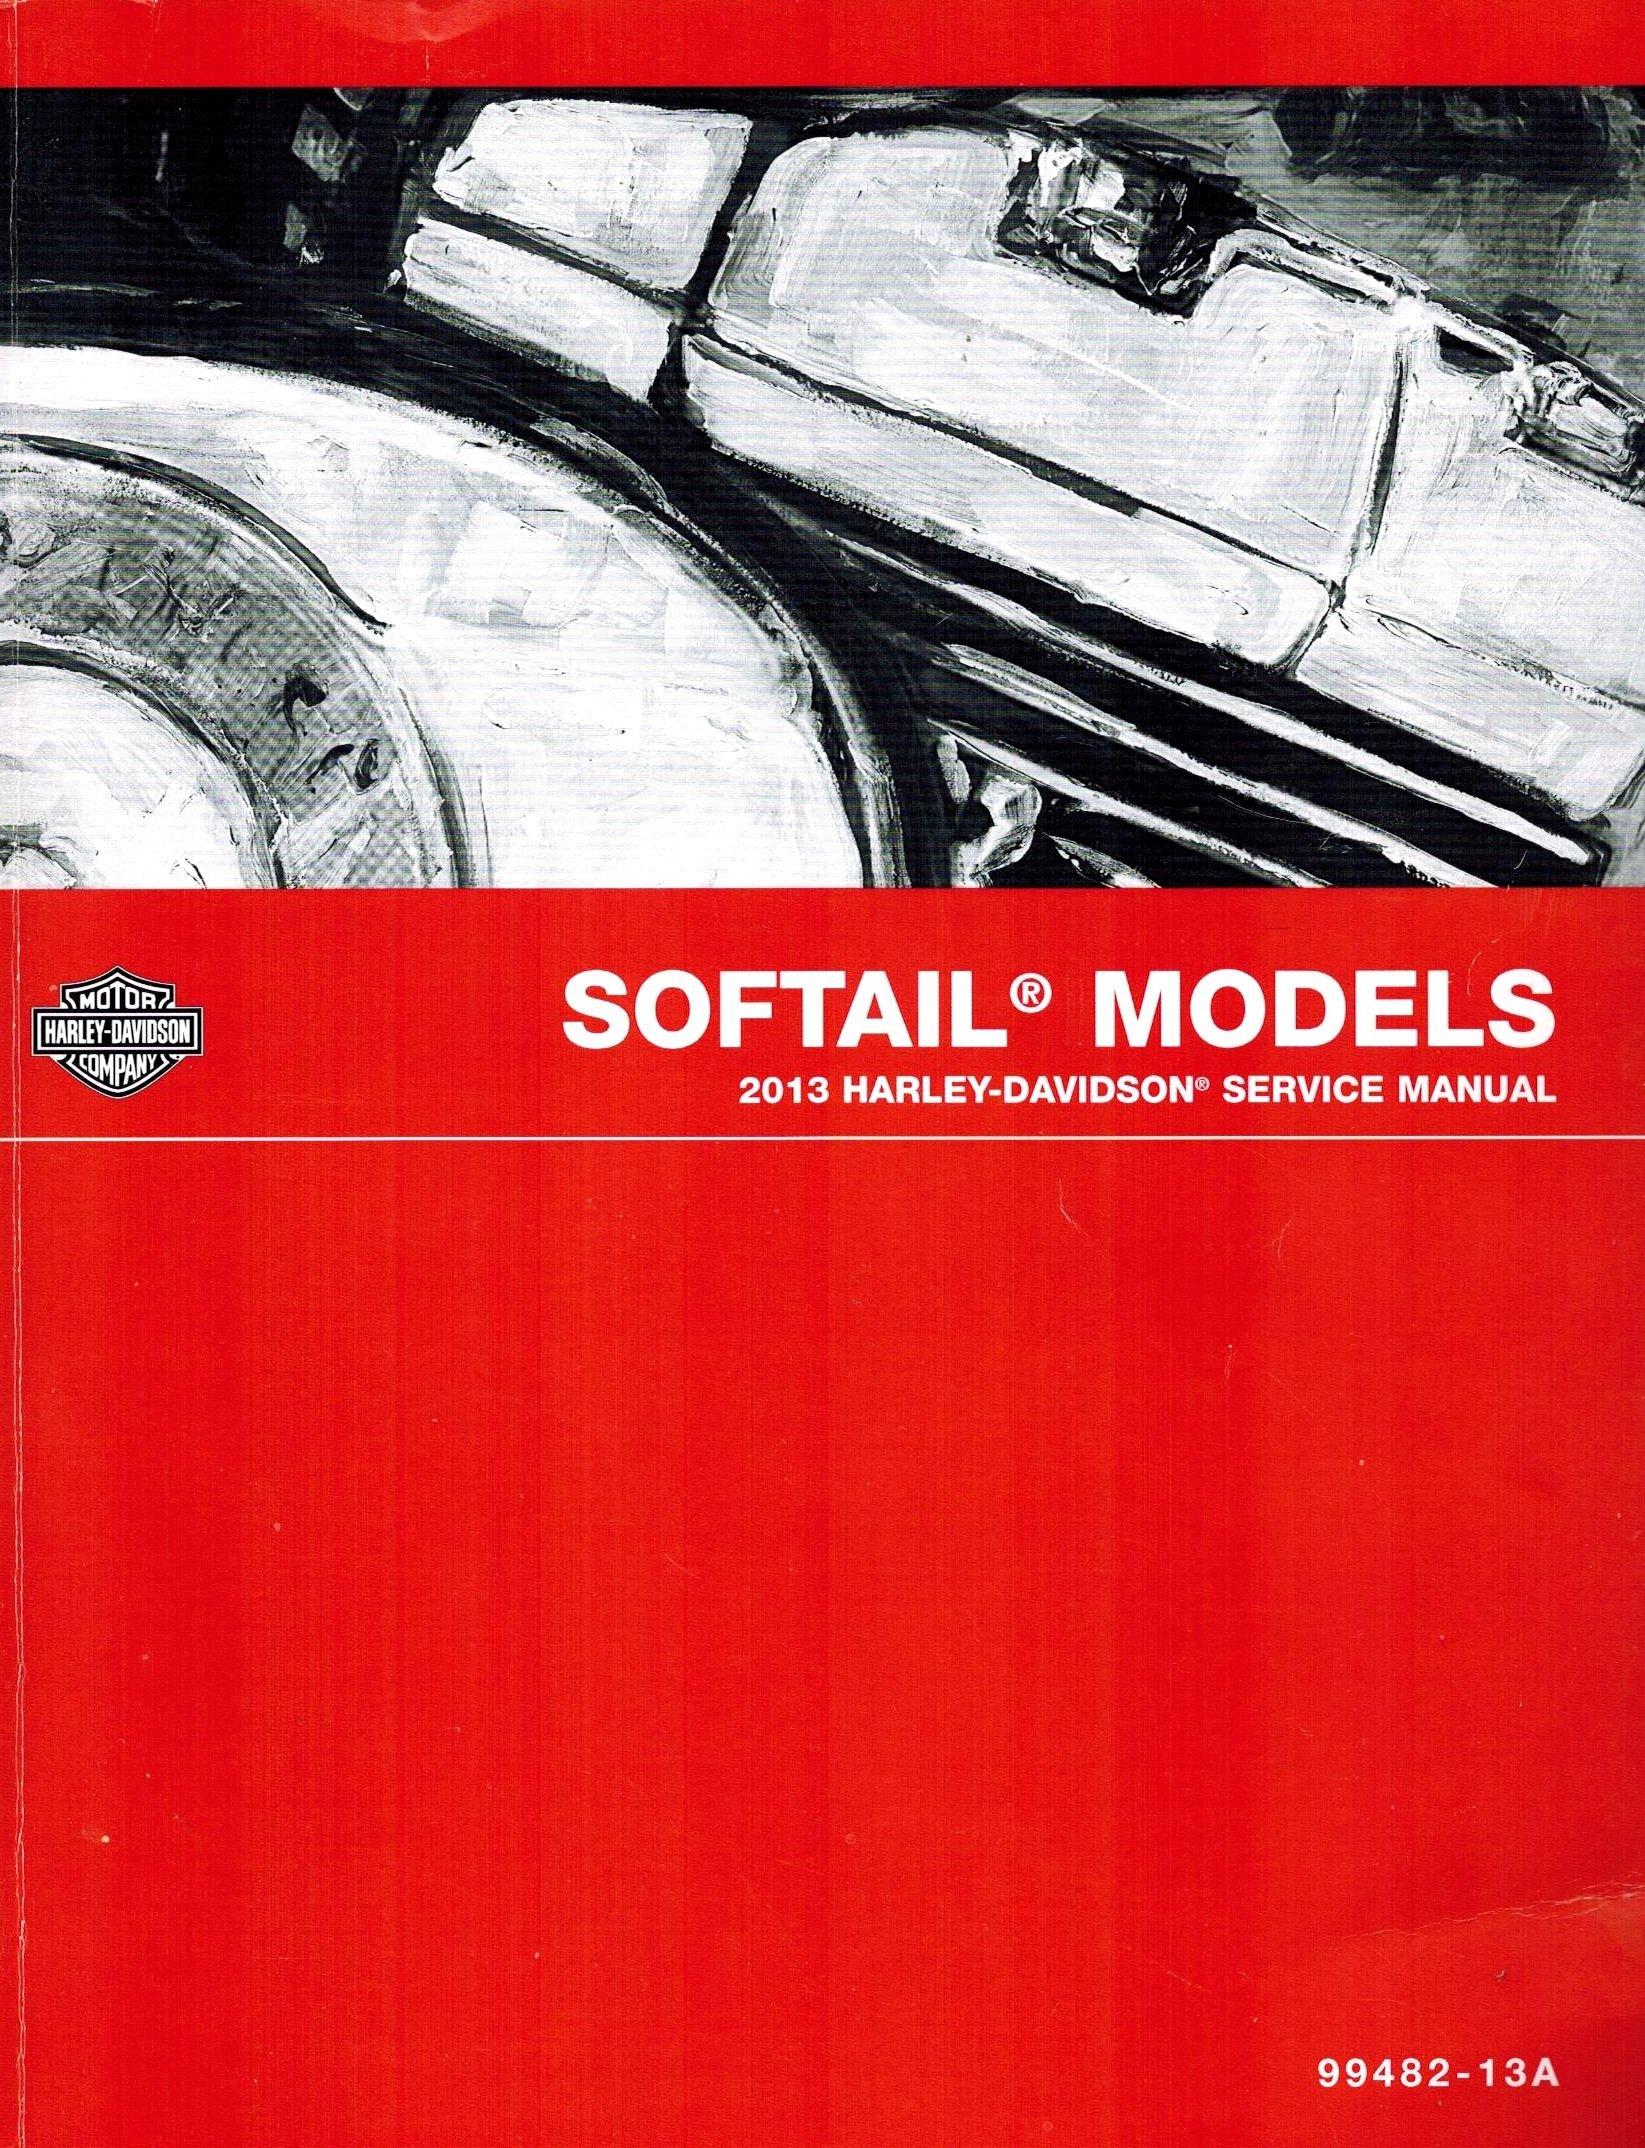 2013 Harley Davidson Softail Model Service Shop Repair Manual PDF